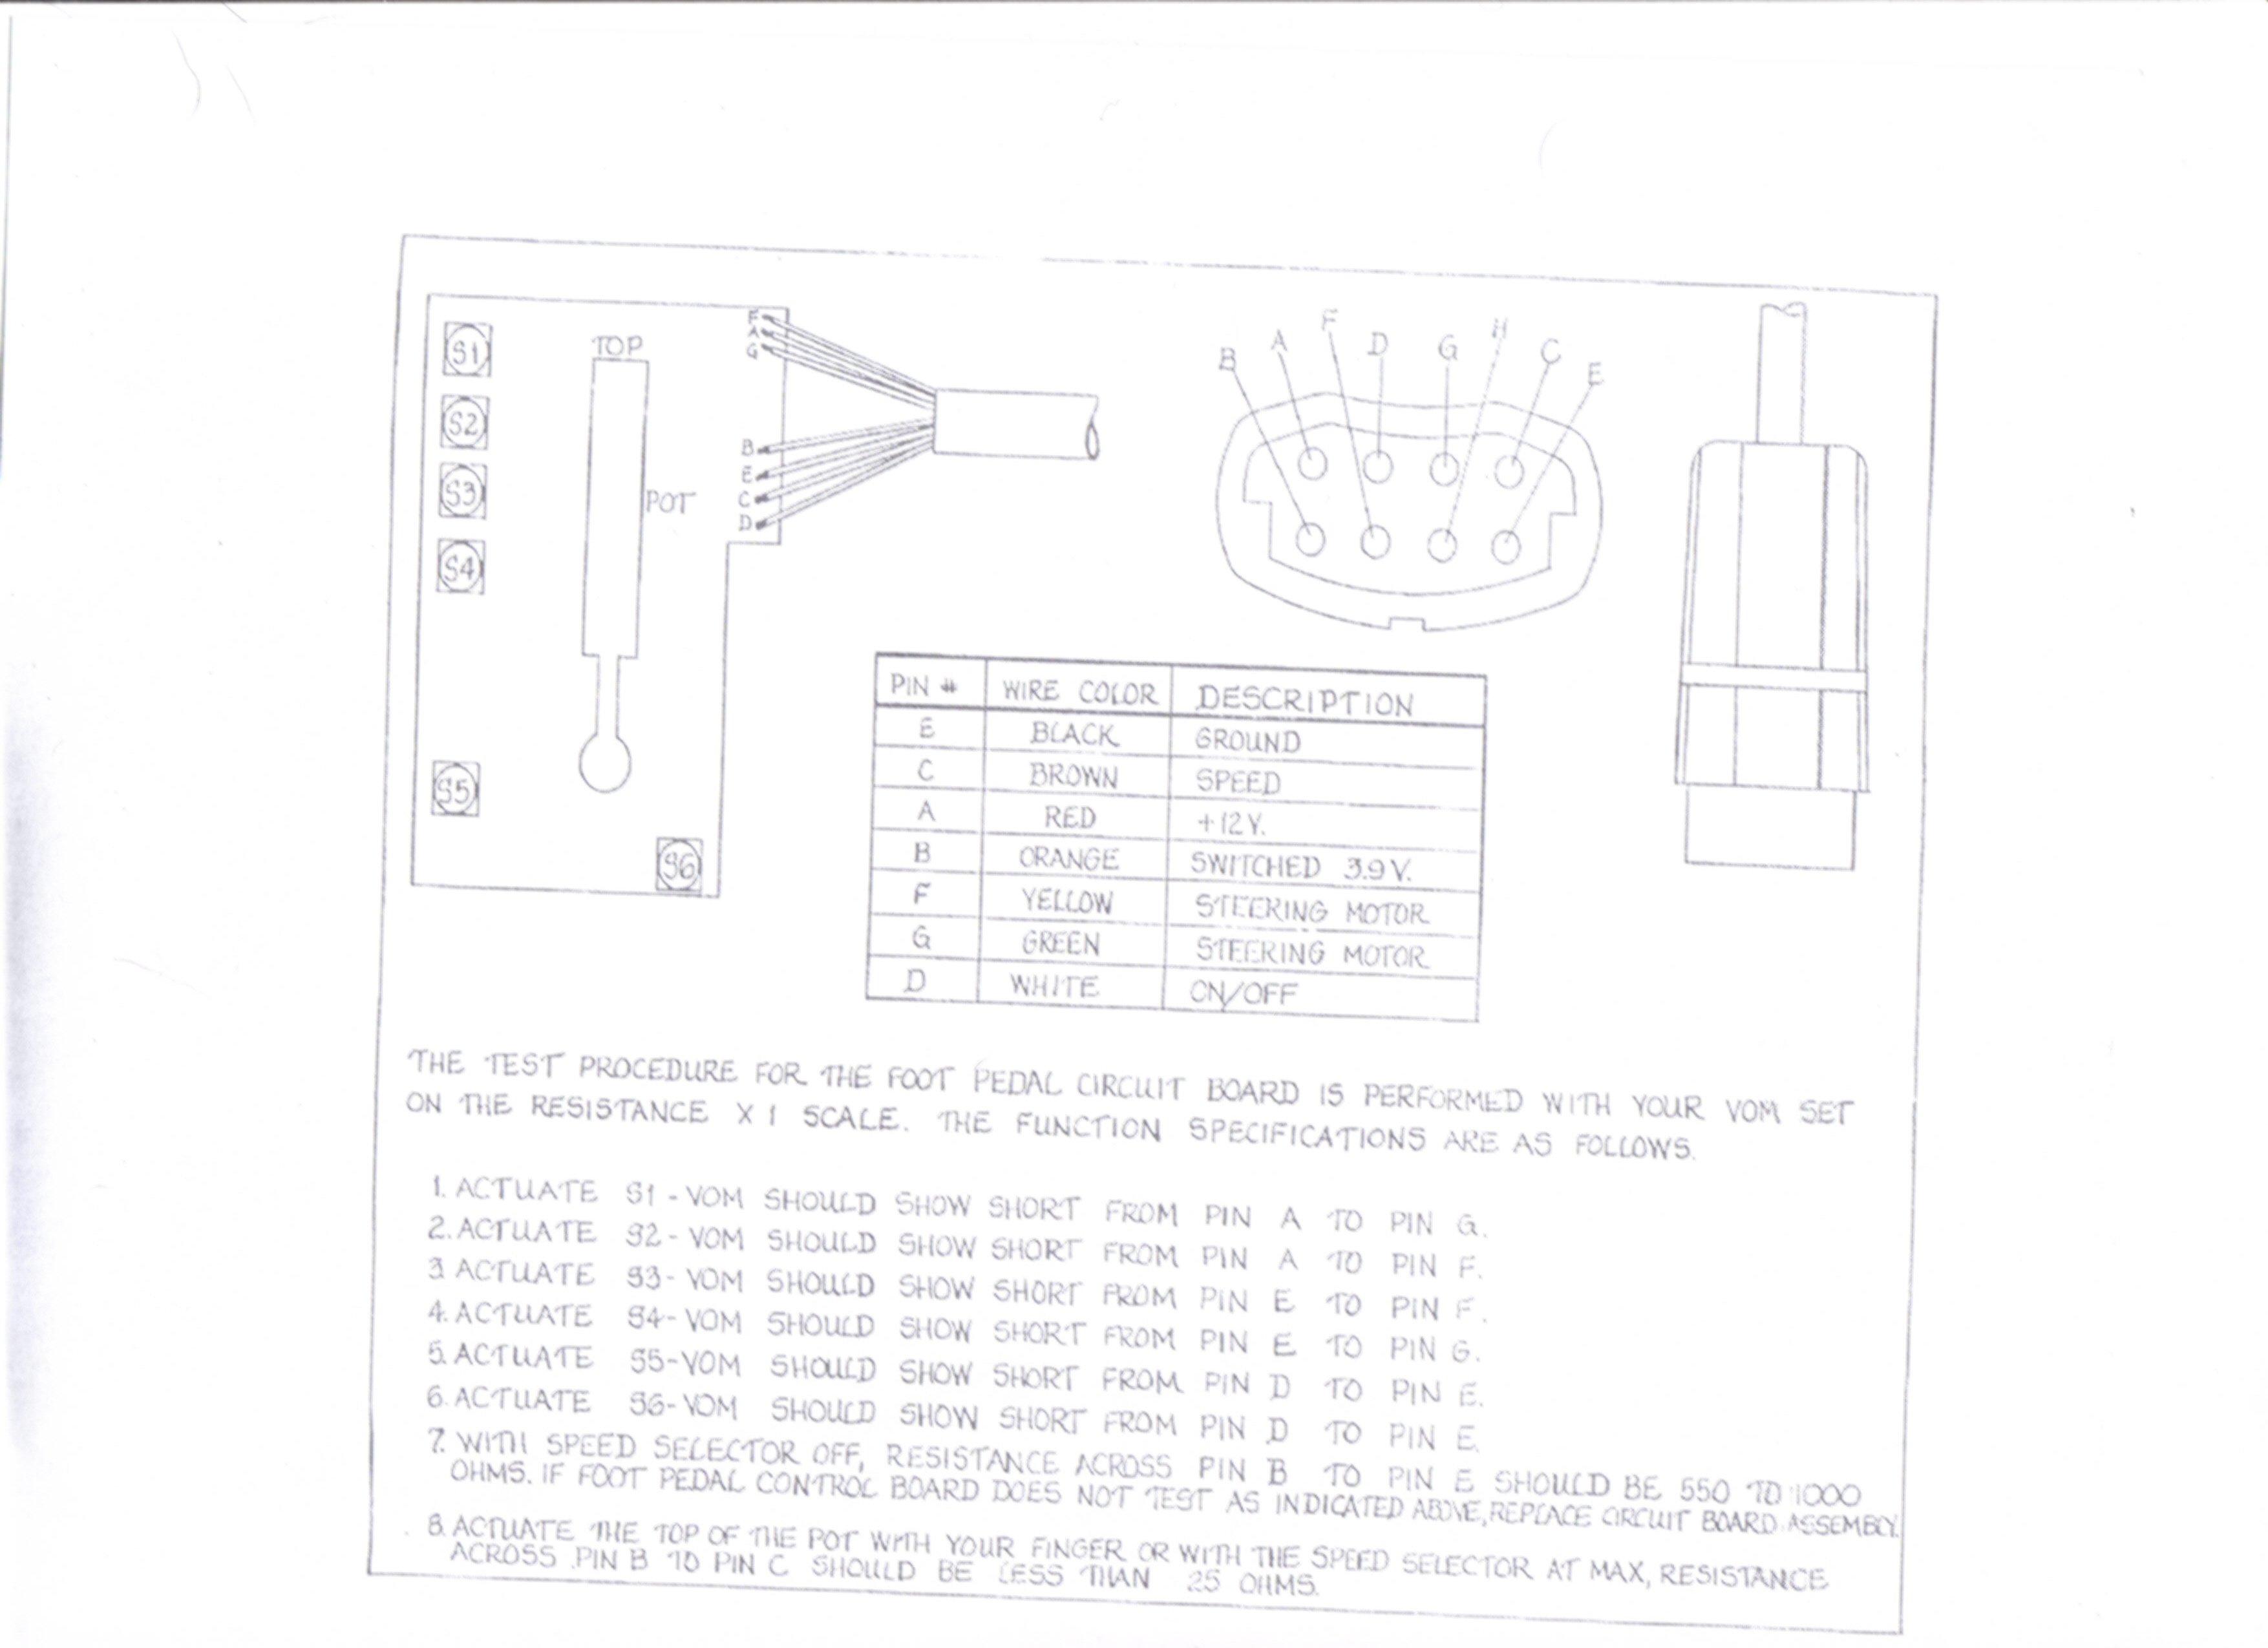 Minnkota Autopilot 24 Volt Plug Wiring Diagram